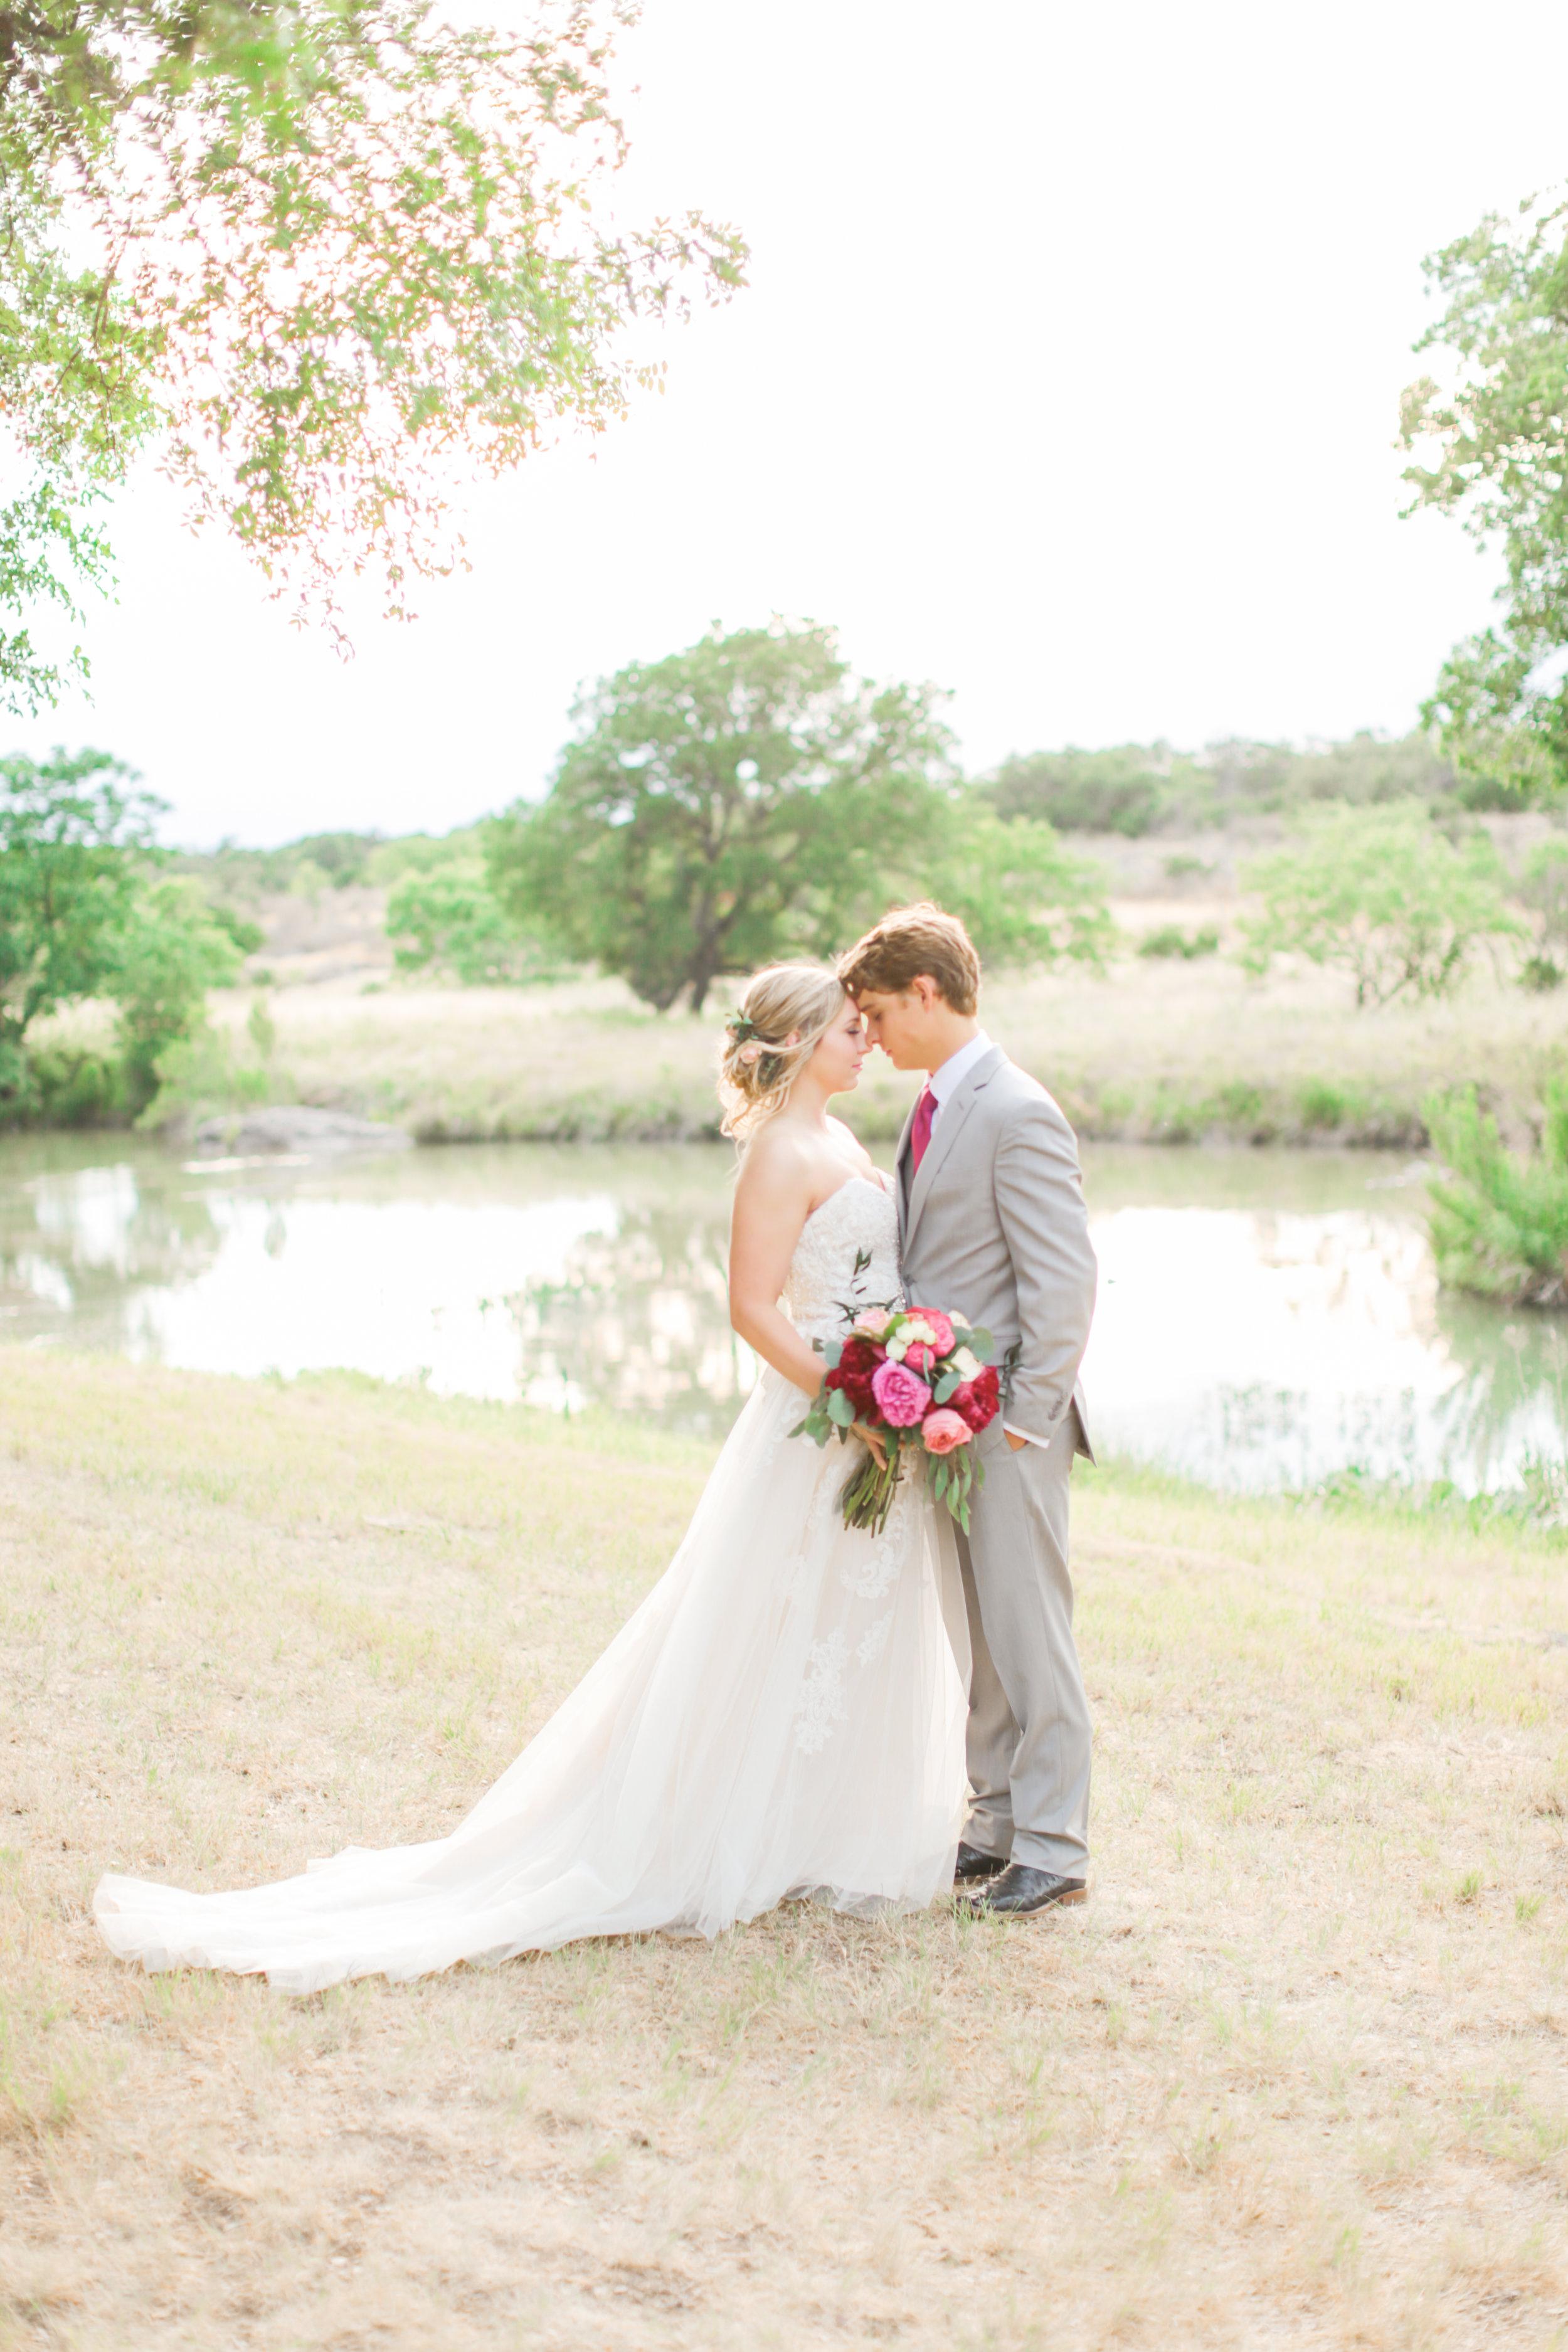 Lewis Wedding Collection - Shara Jo Photography-77.jpg